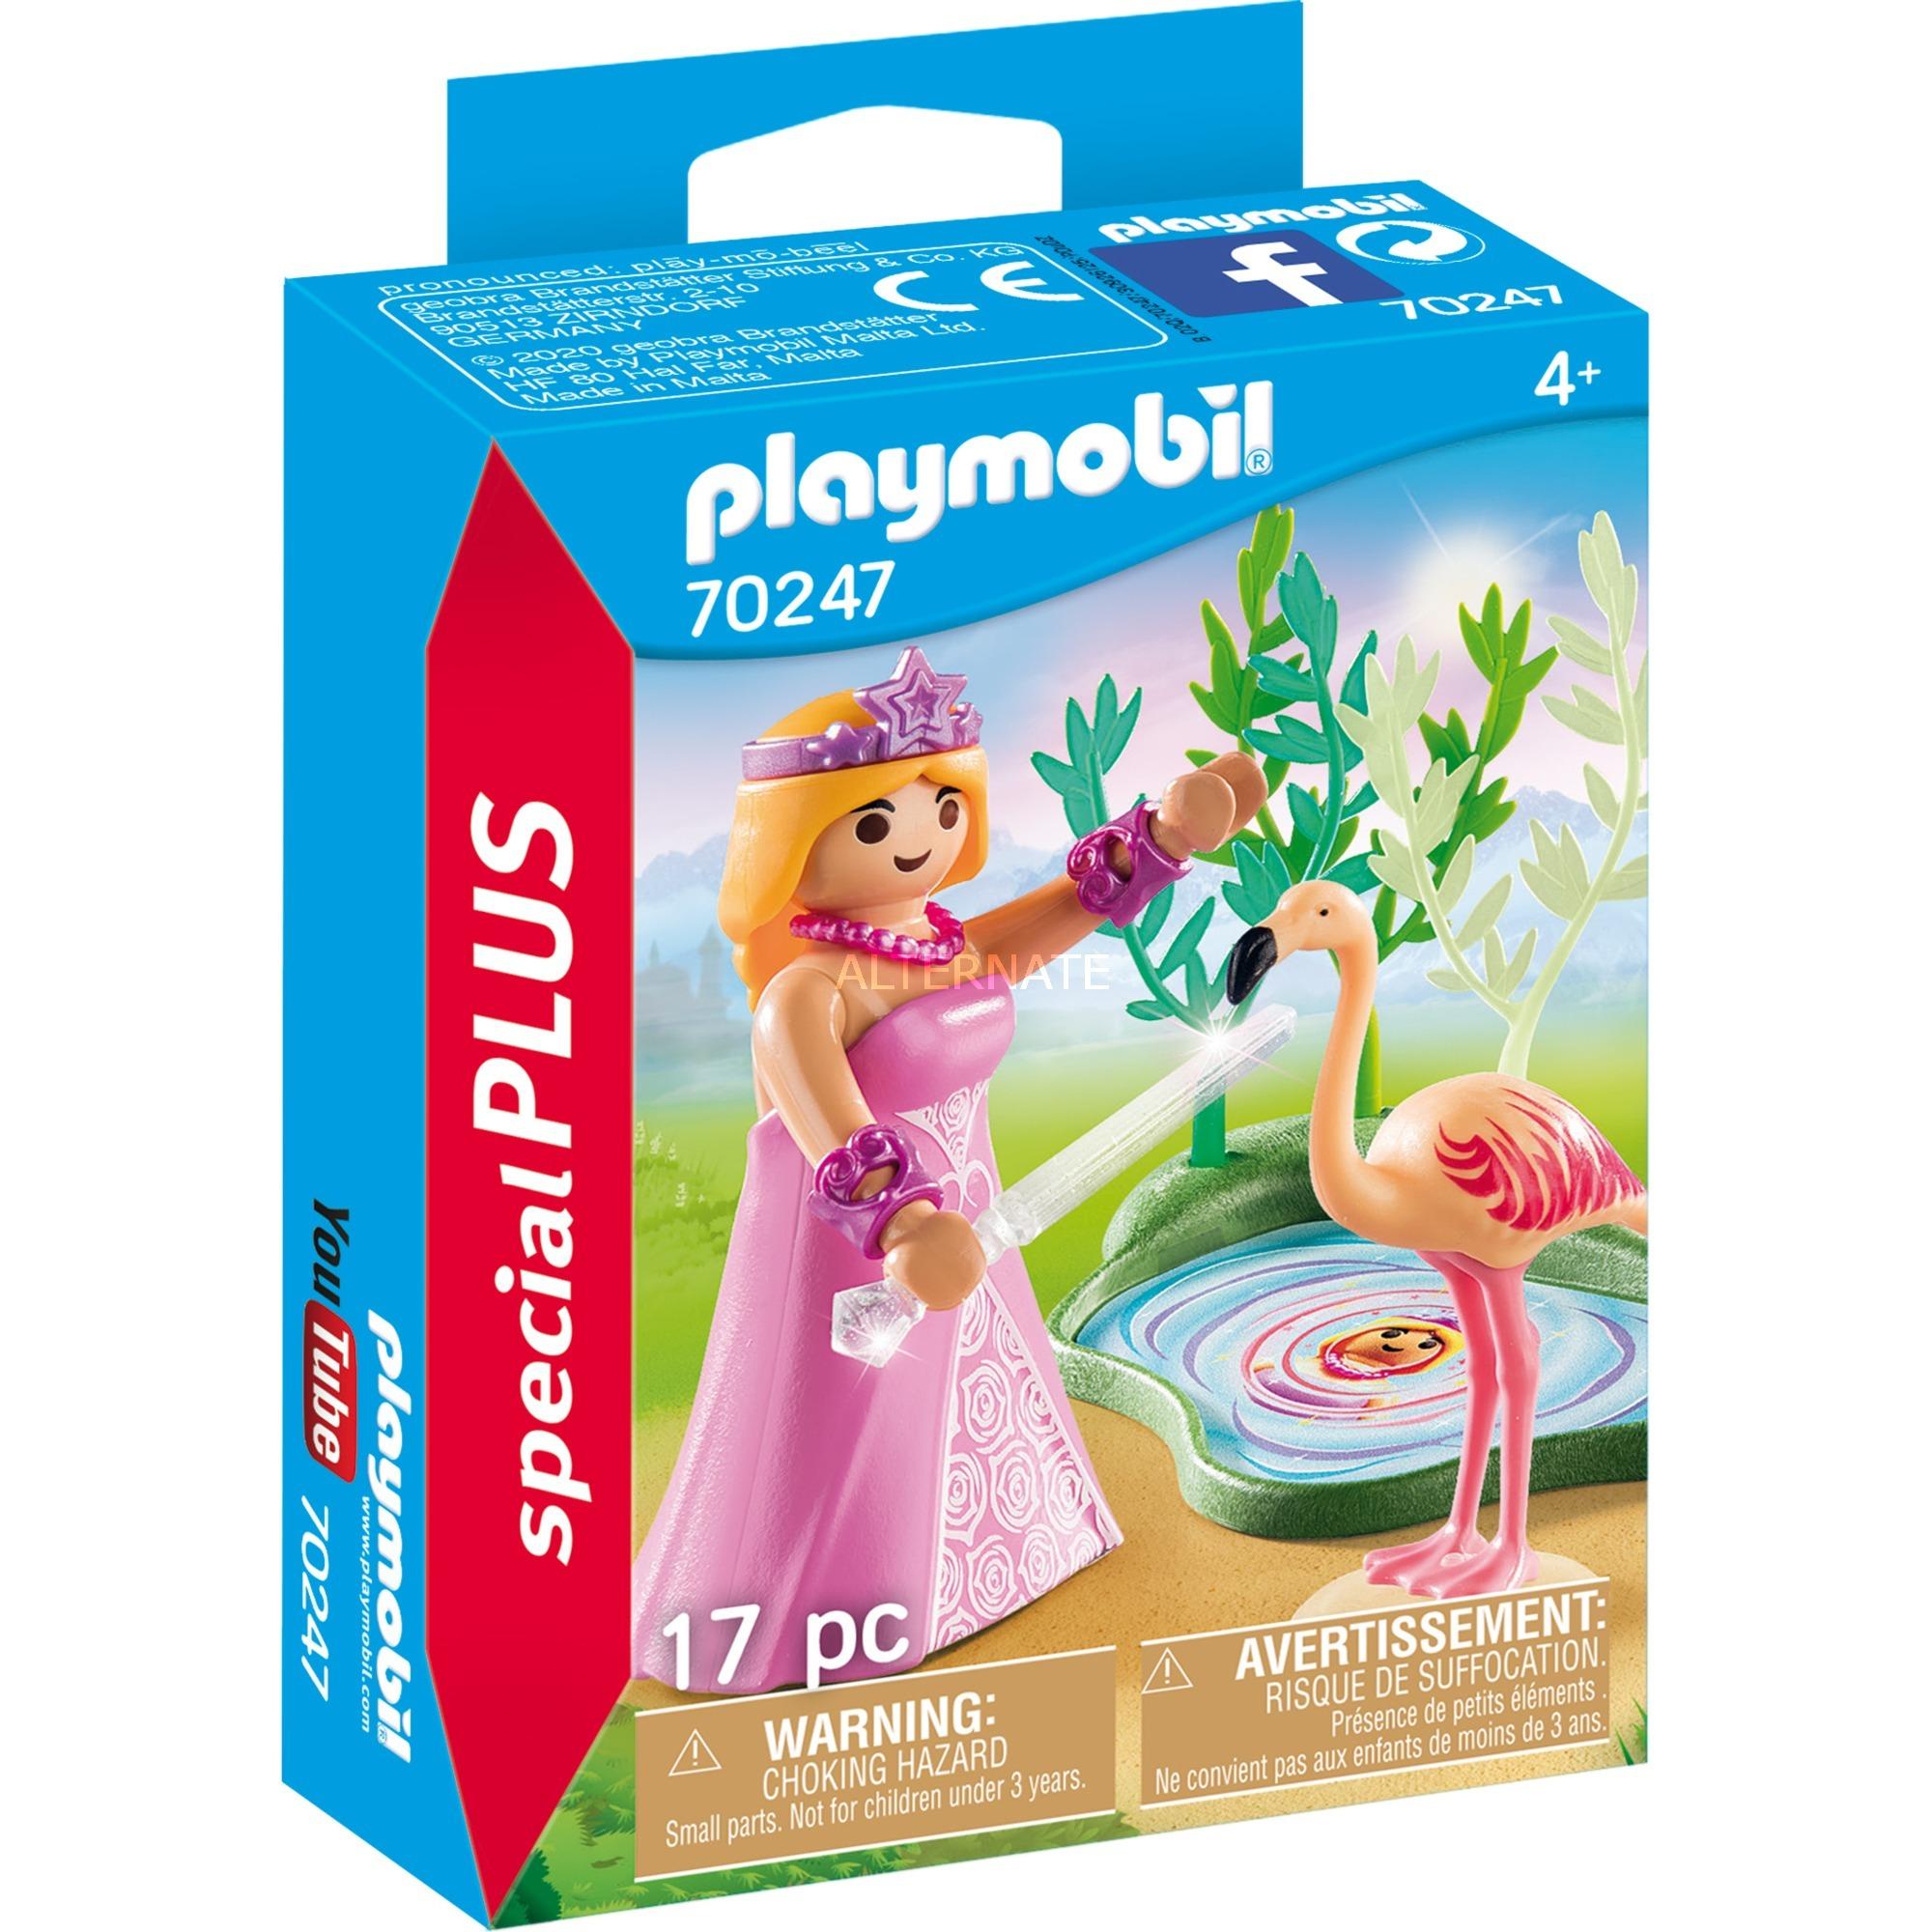 PLAYMOBIL-70247-playmobil-figur-set-prinsessa-